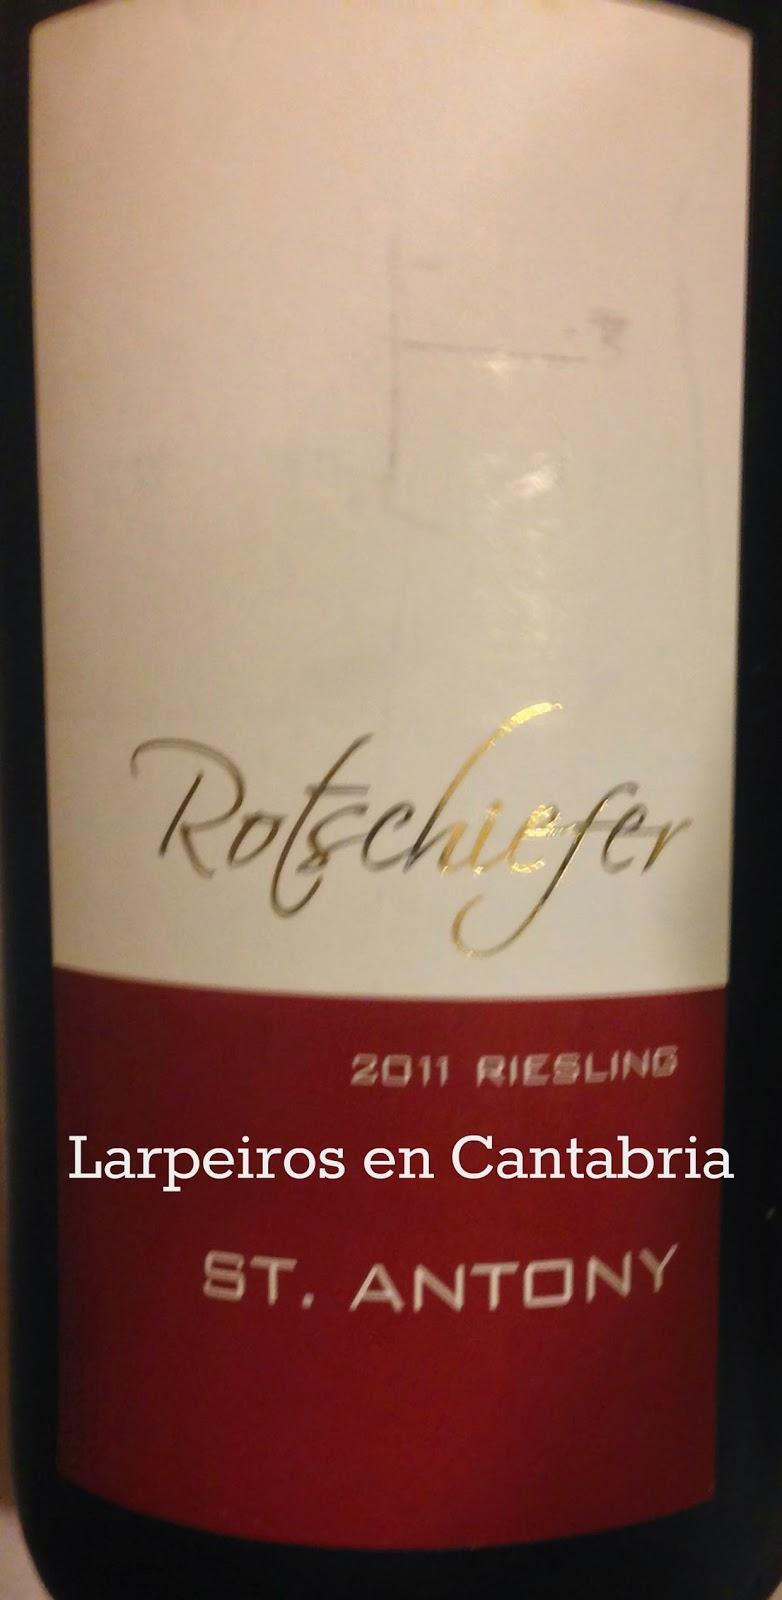 Vino Blanco Rotschiefer Riesling 2011: Estaba bueno